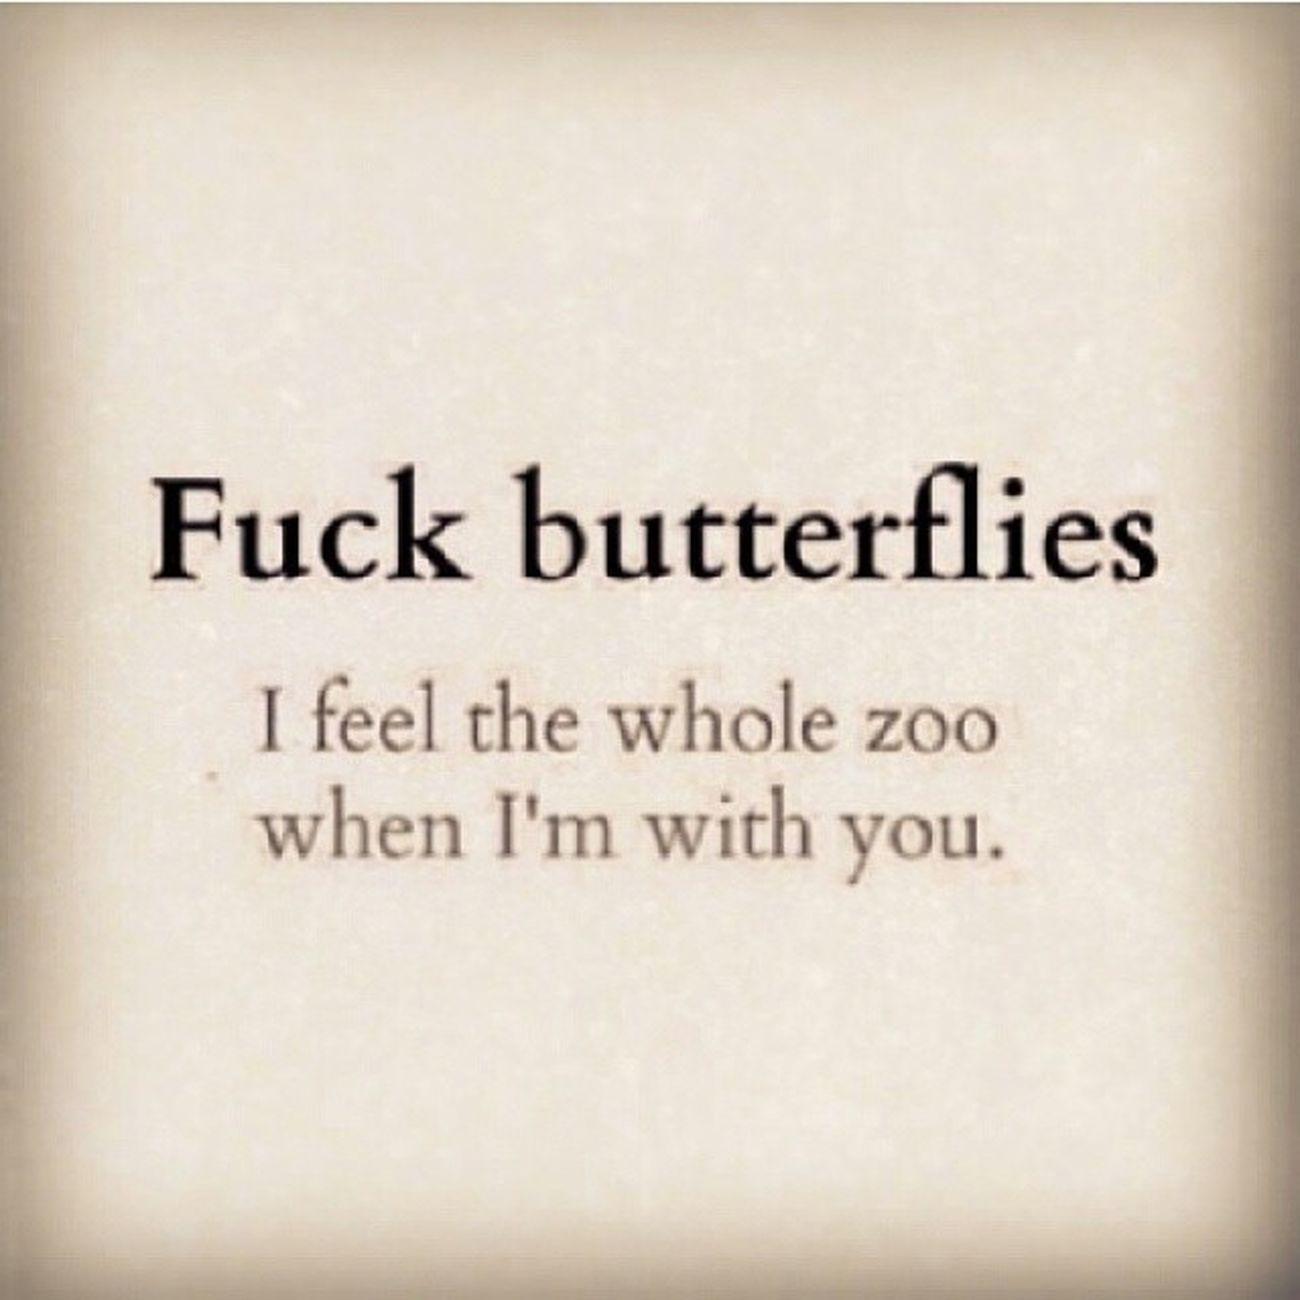 Myjwoww Givesmebutterflies Goodfeeling ♥